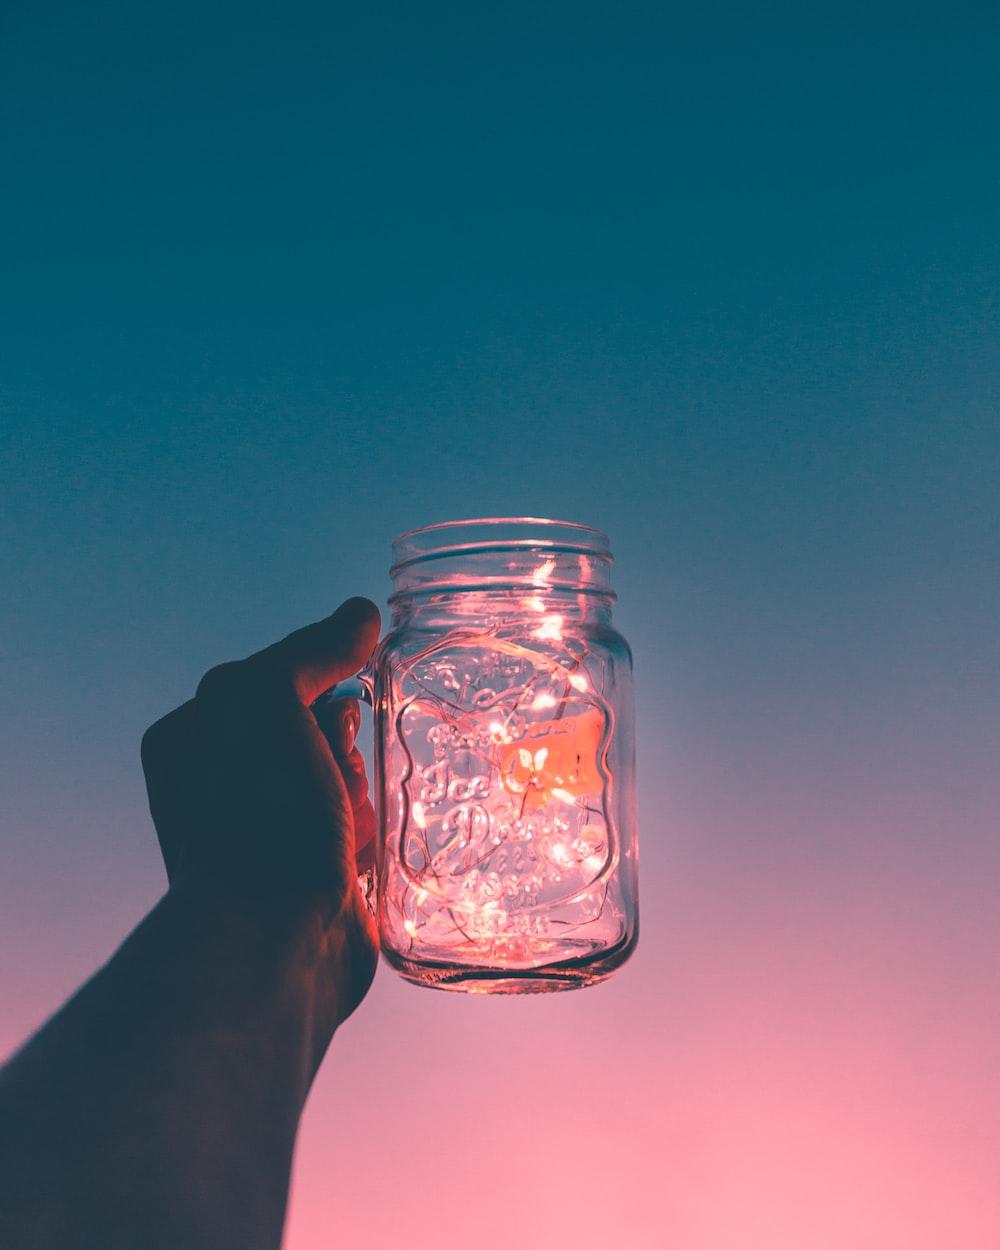 person holding clear glass mug jar